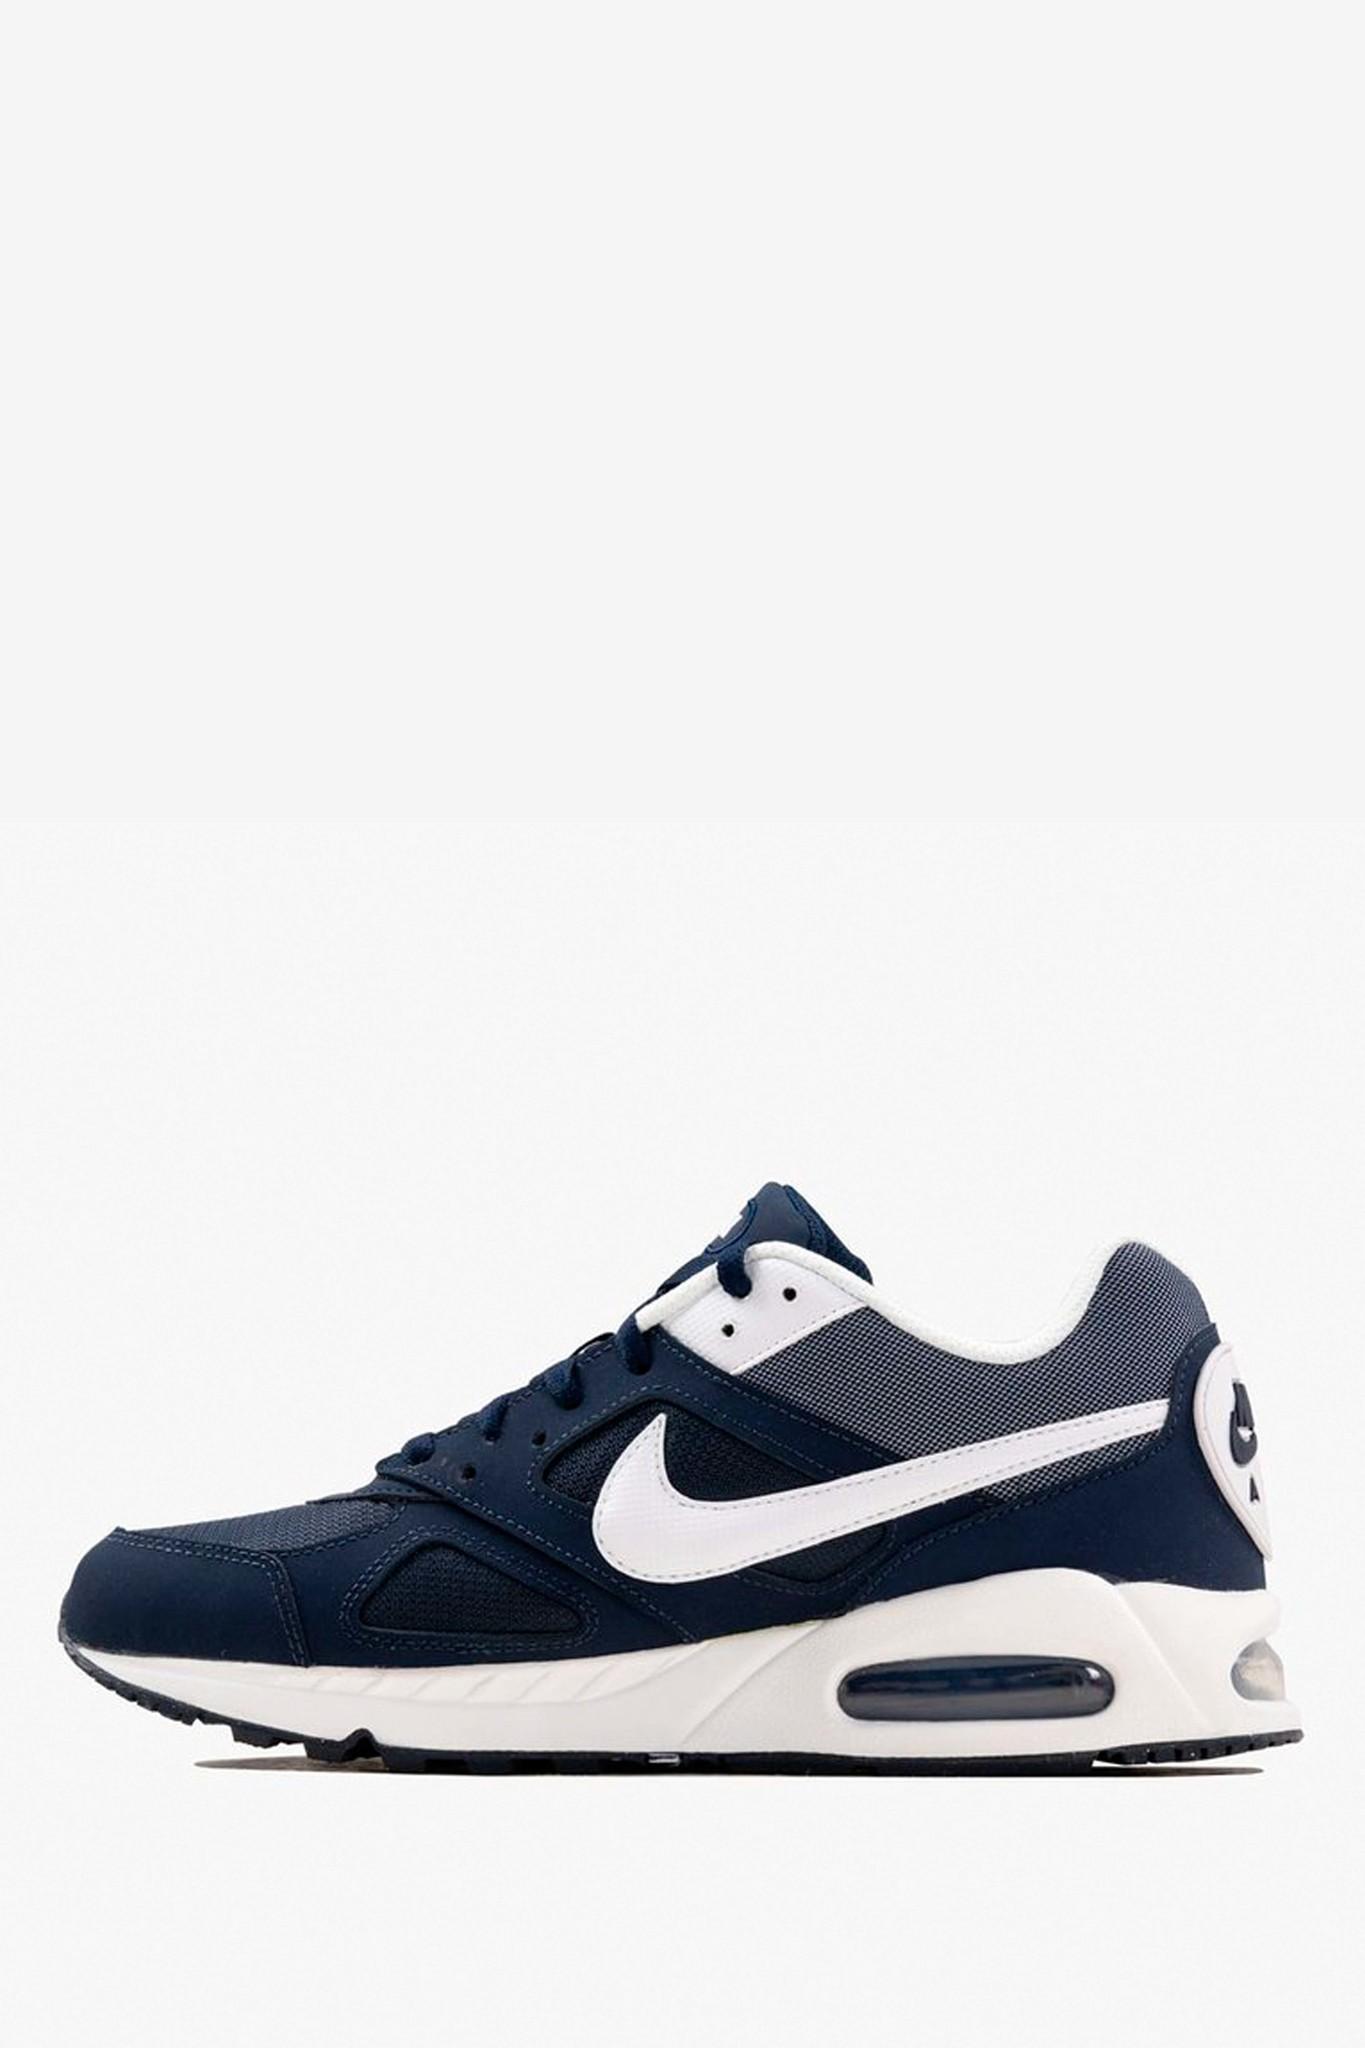 Nike | Кроссовки | Синяя кожа